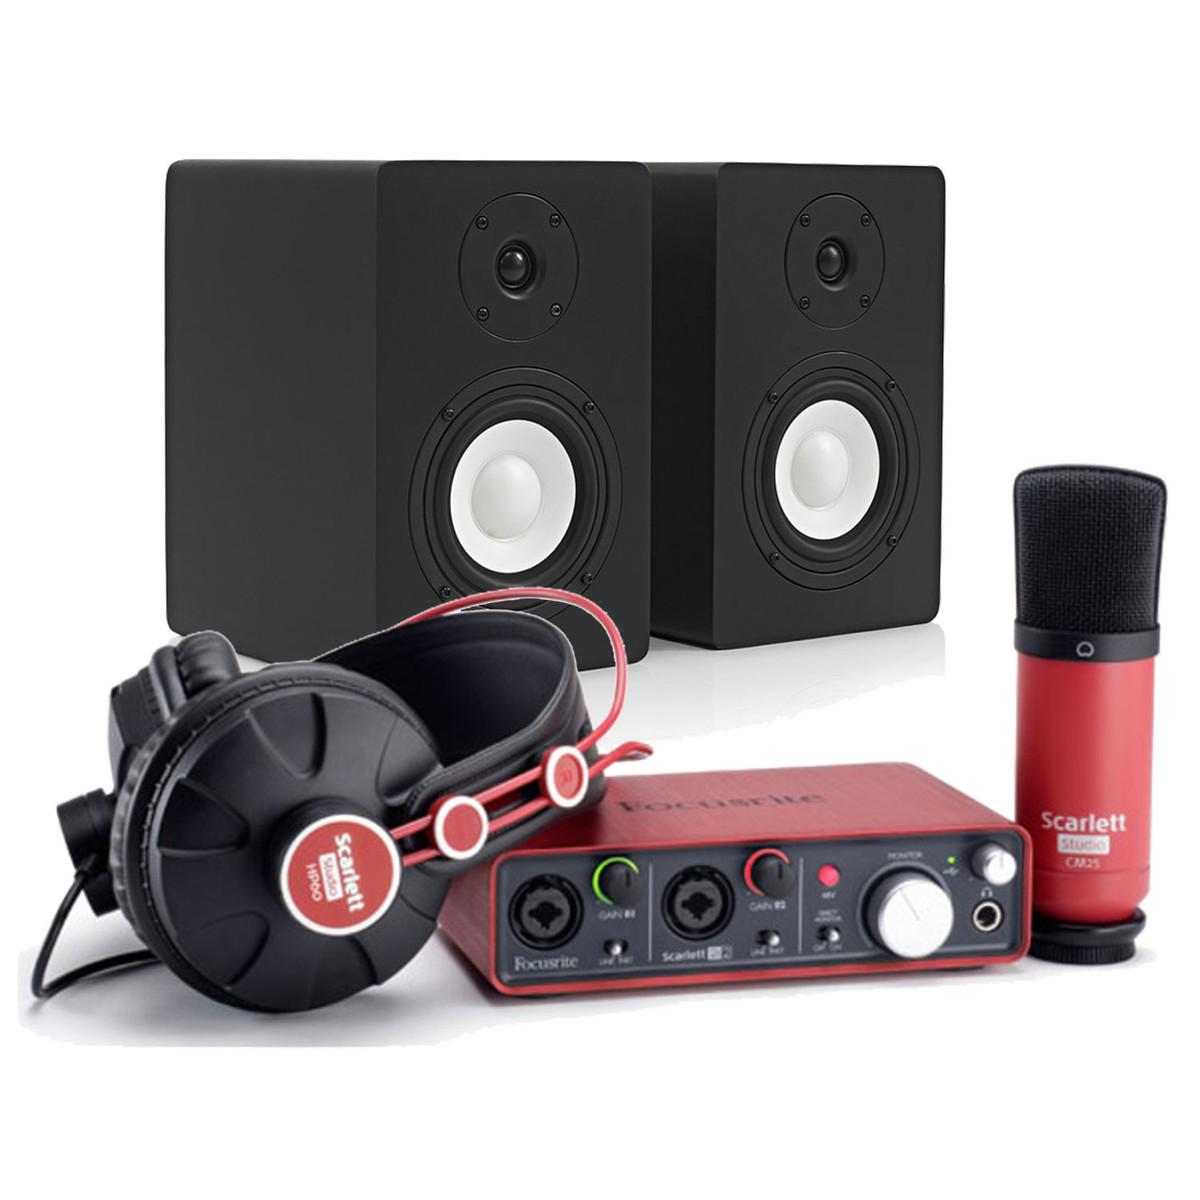 focusrite scarlett pack enregistrement studio avec moniteurs subzero sz 5a. Black Bedroom Furniture Sets. Home Design Ideas